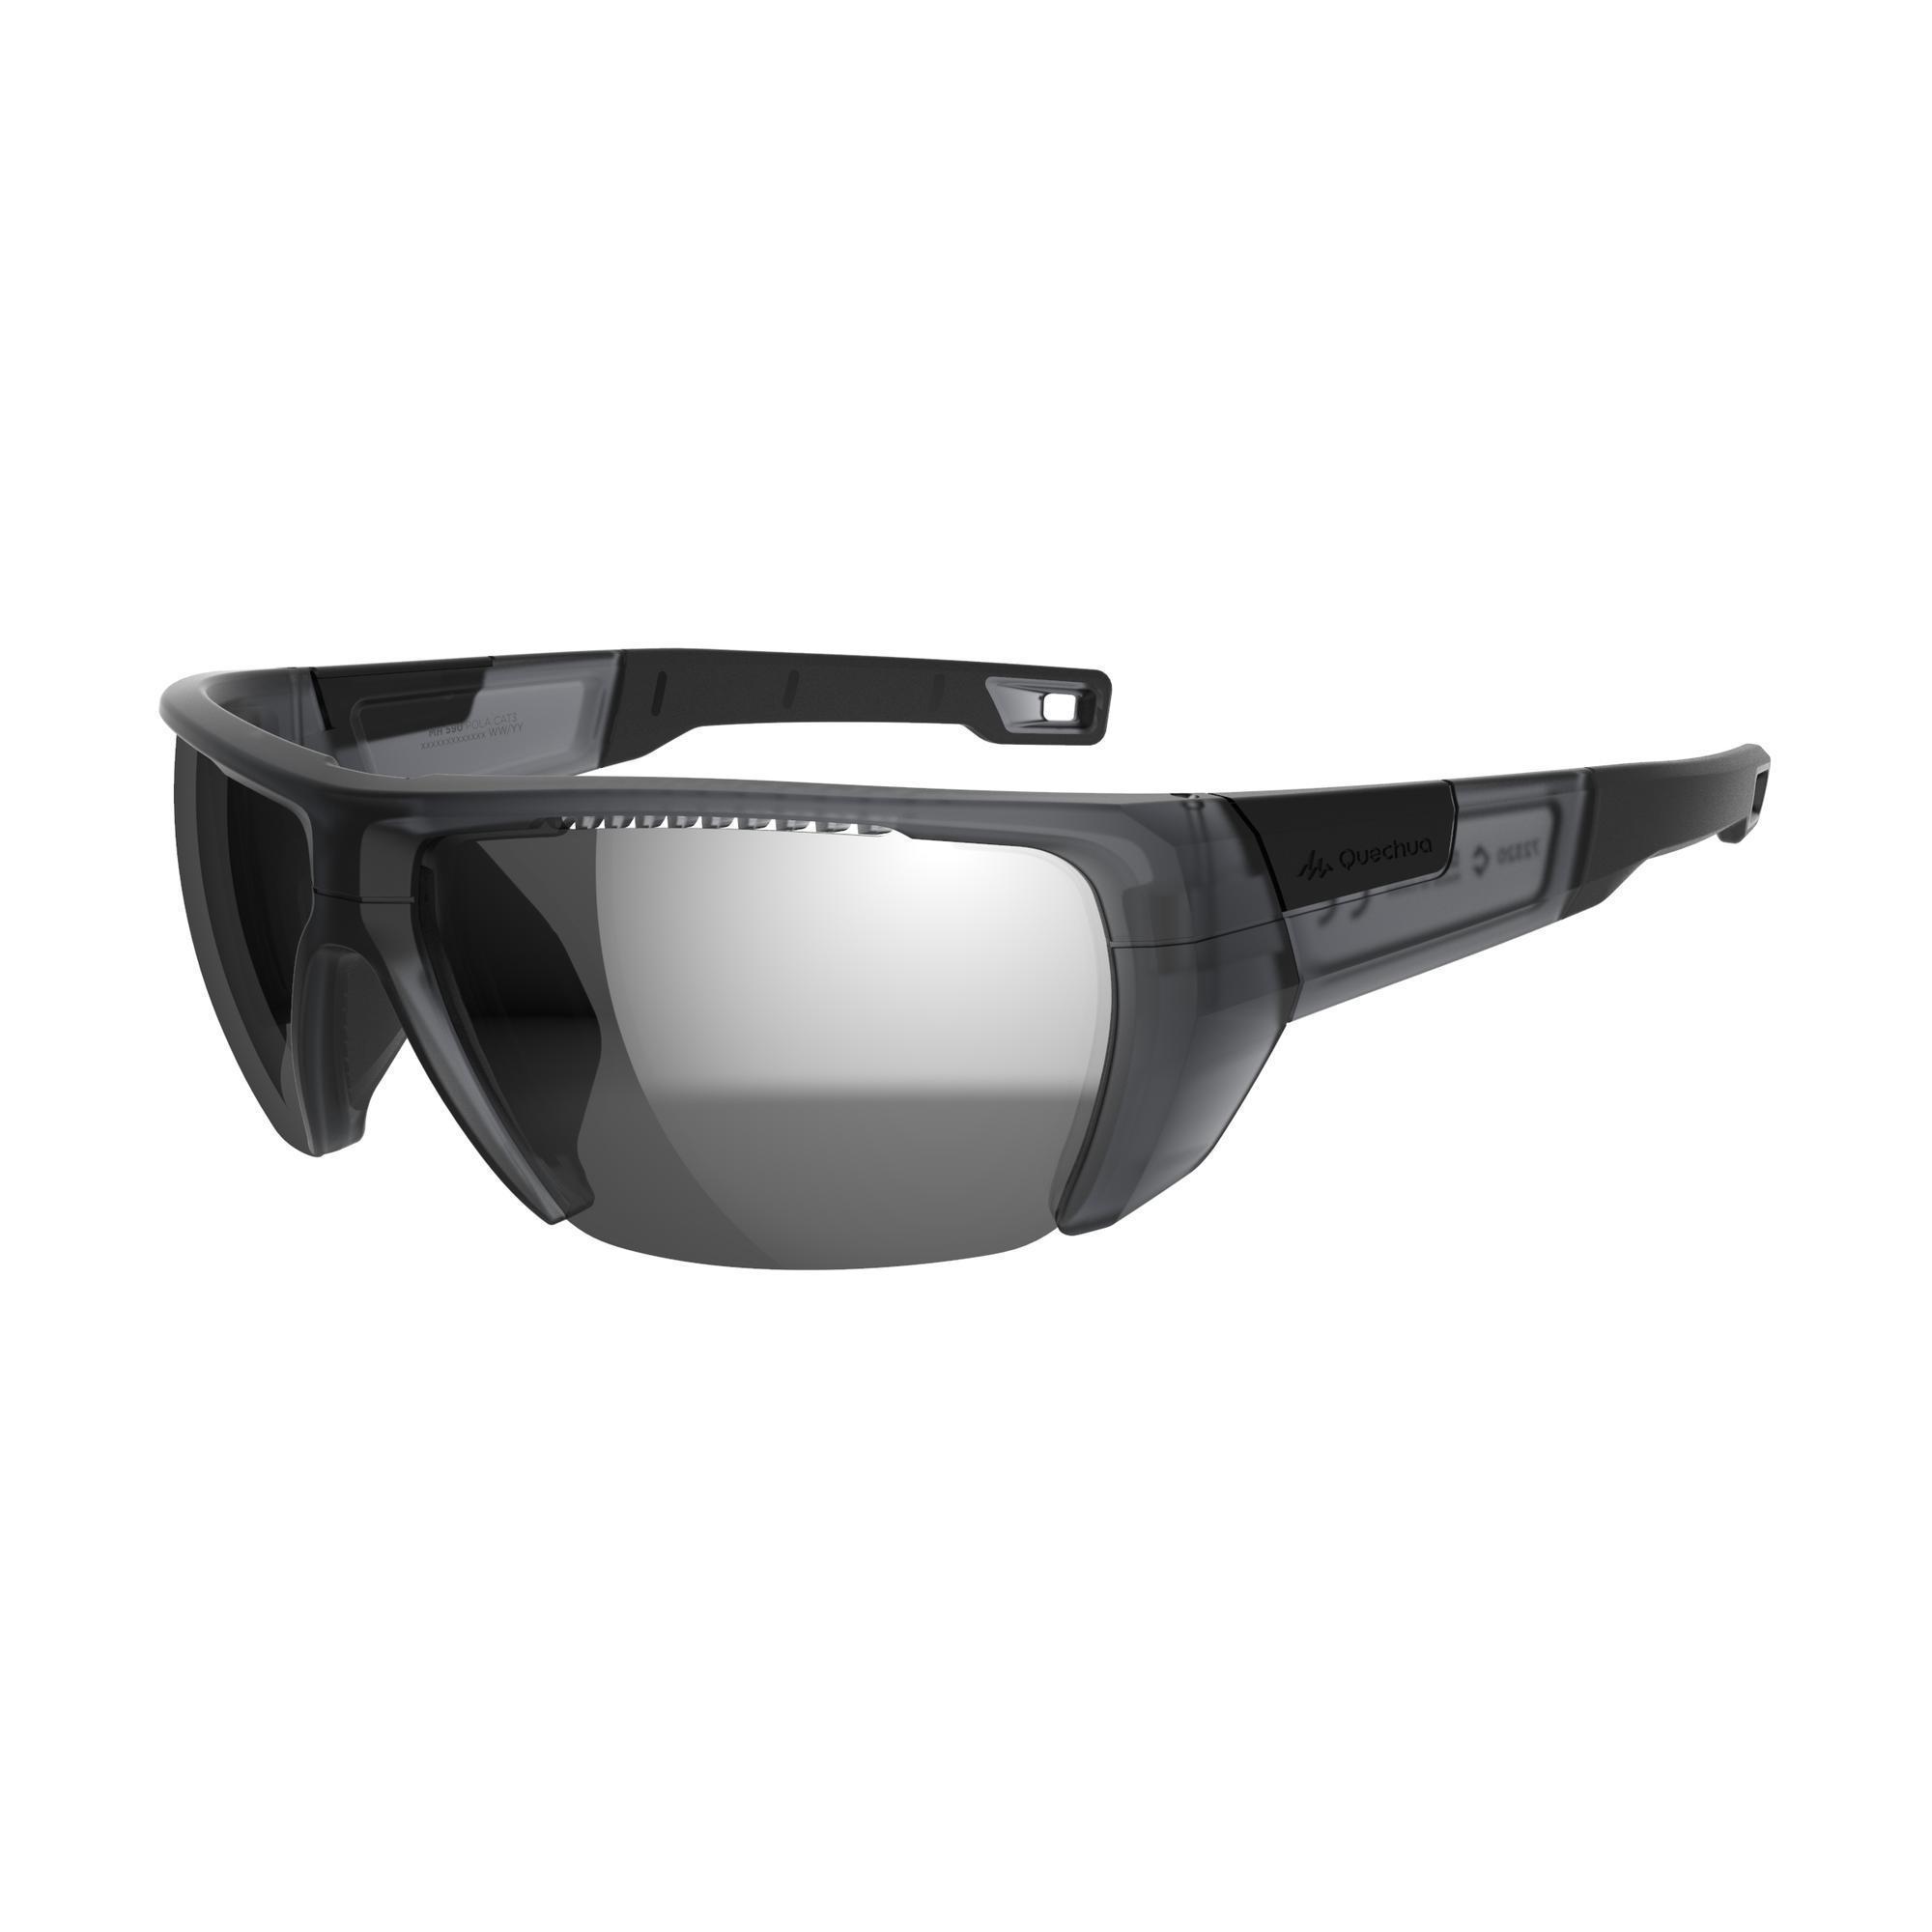 Sonnenbrille MH590 polarisierend Kategorie4 Erwachsene   Accessoires > Sonnenbrillen   Quechua